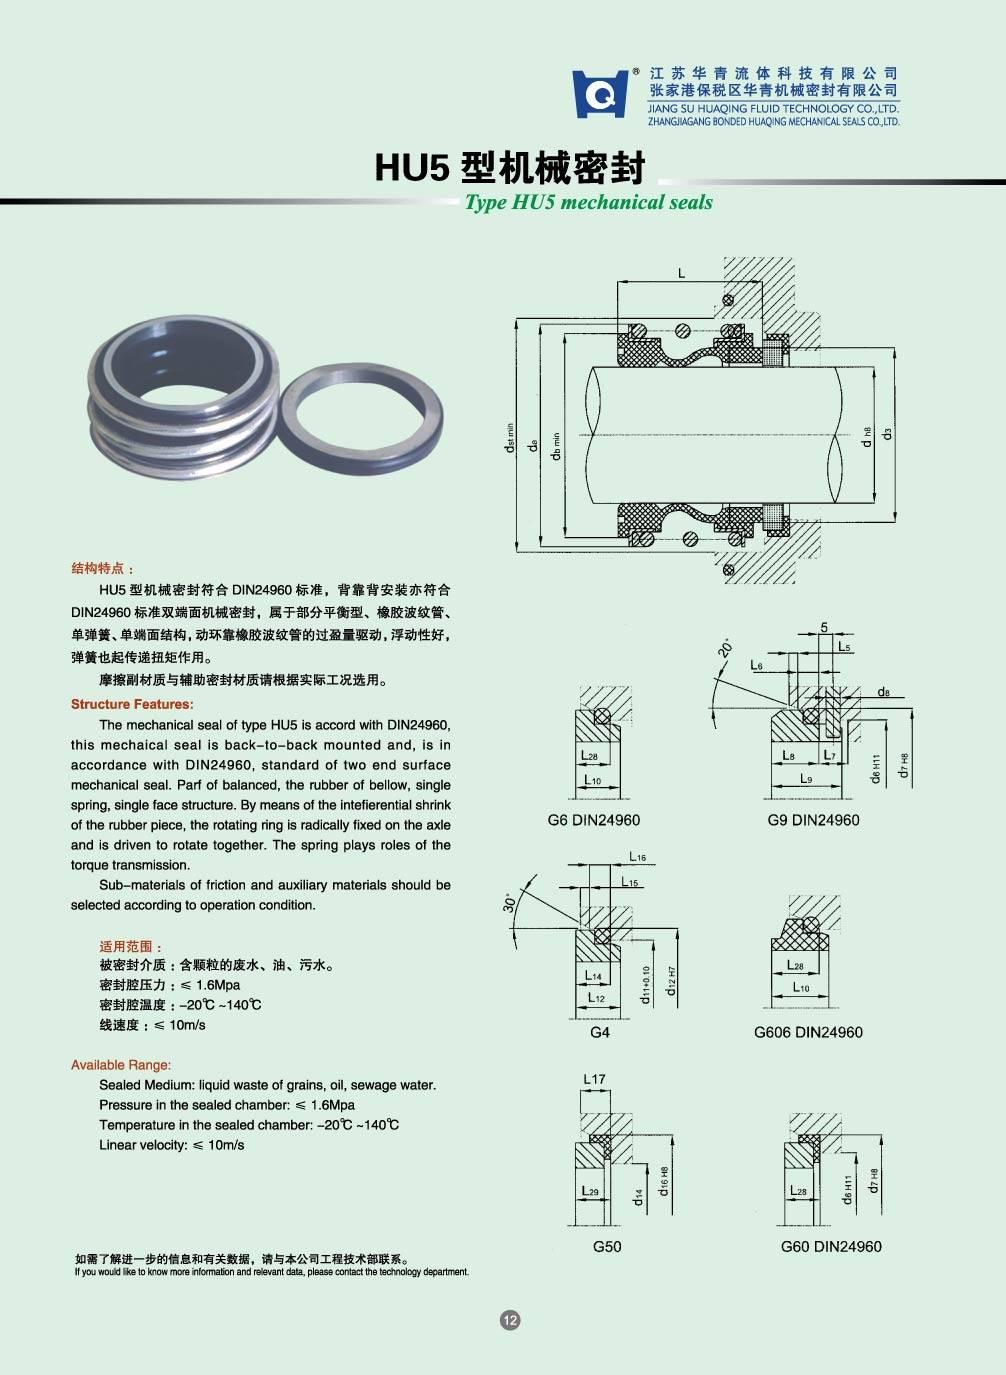 Pump mechanical seal MG1-45-G60